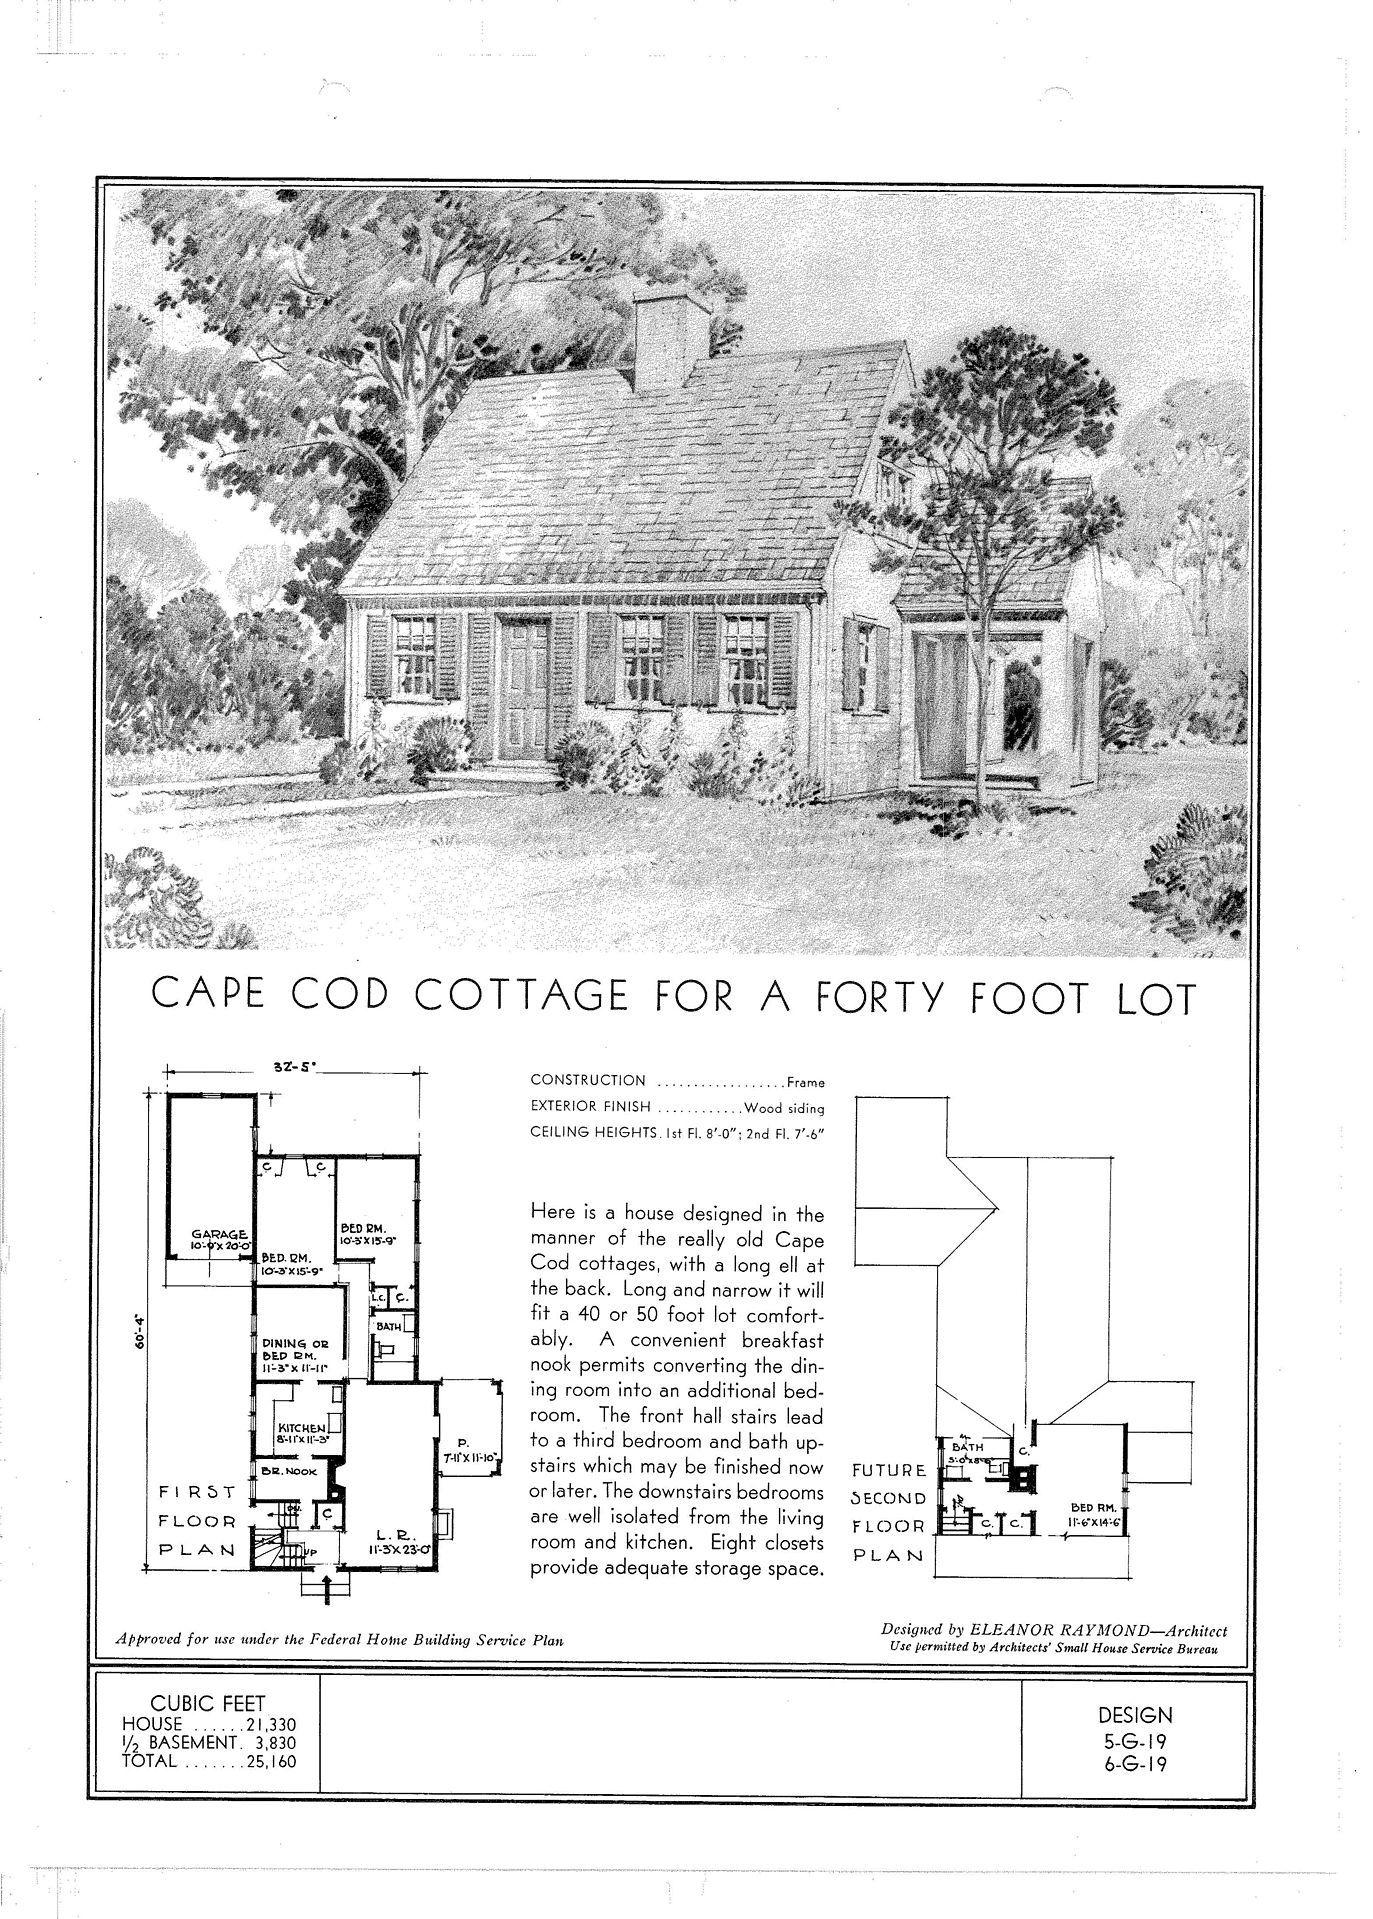 Federal Style House Plans : federal, style, house, plans, Federal, Government, Plans, Three-quarter, House, Designed, Eleanor, Raymond, Style, House,, Vintage